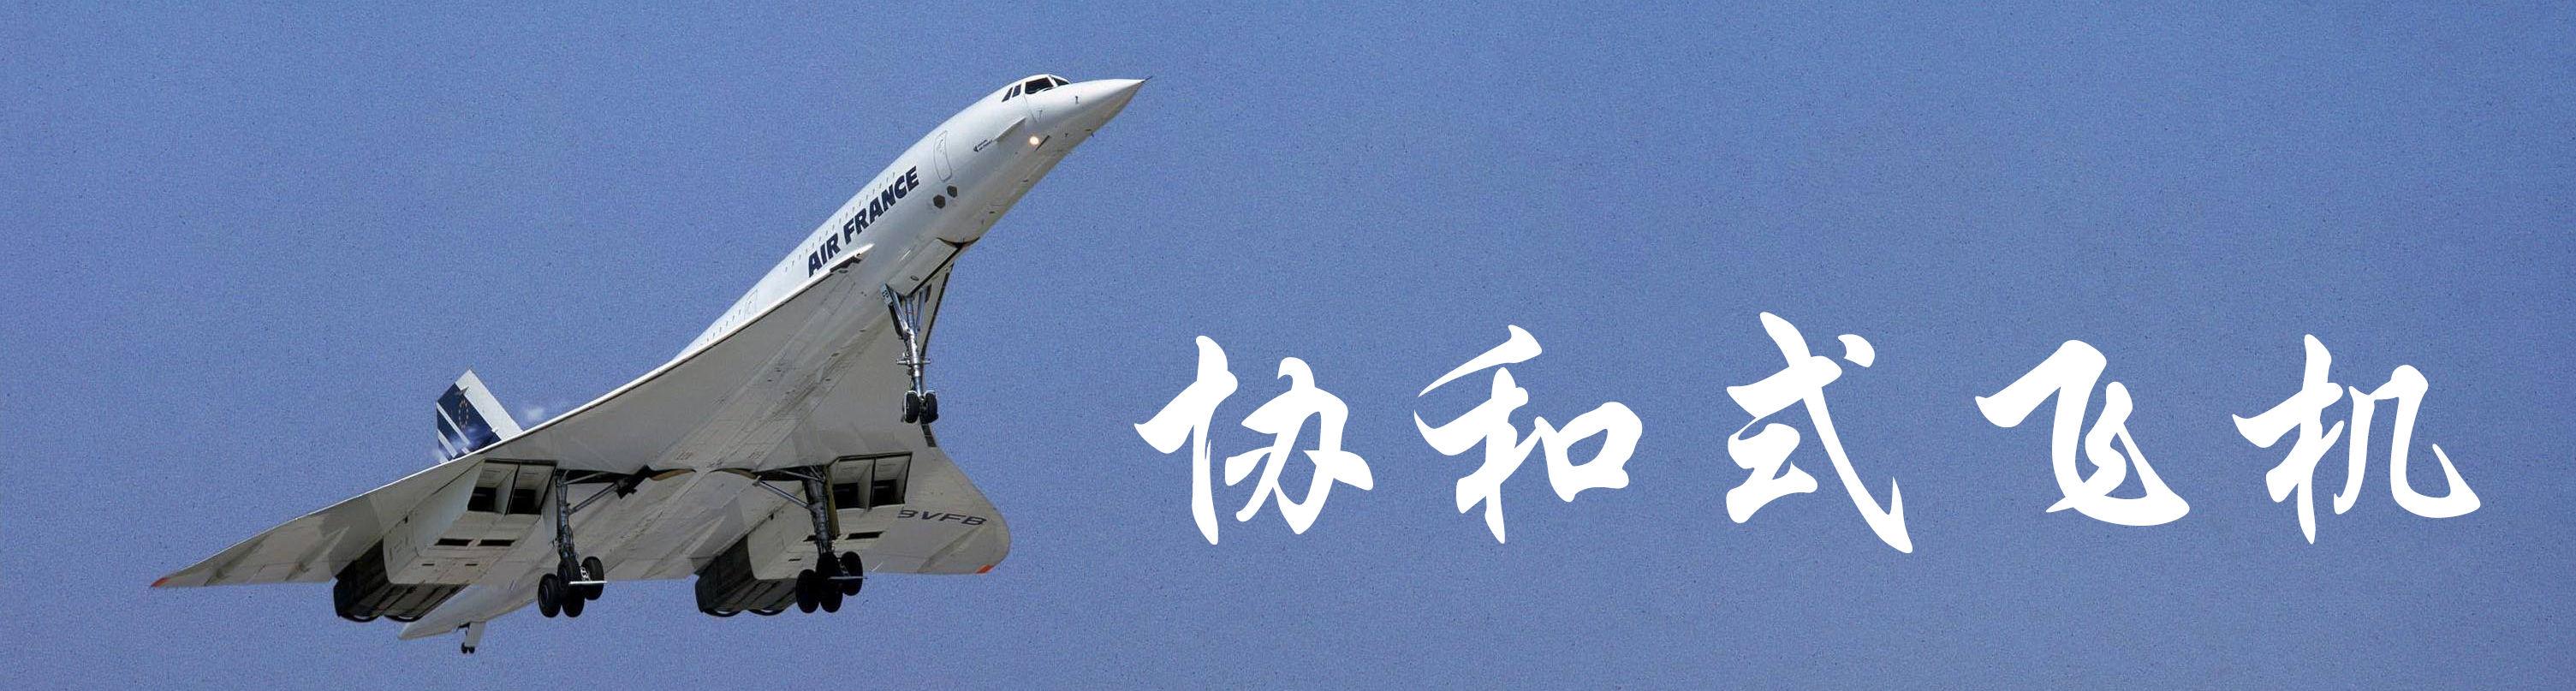 协和式飞机